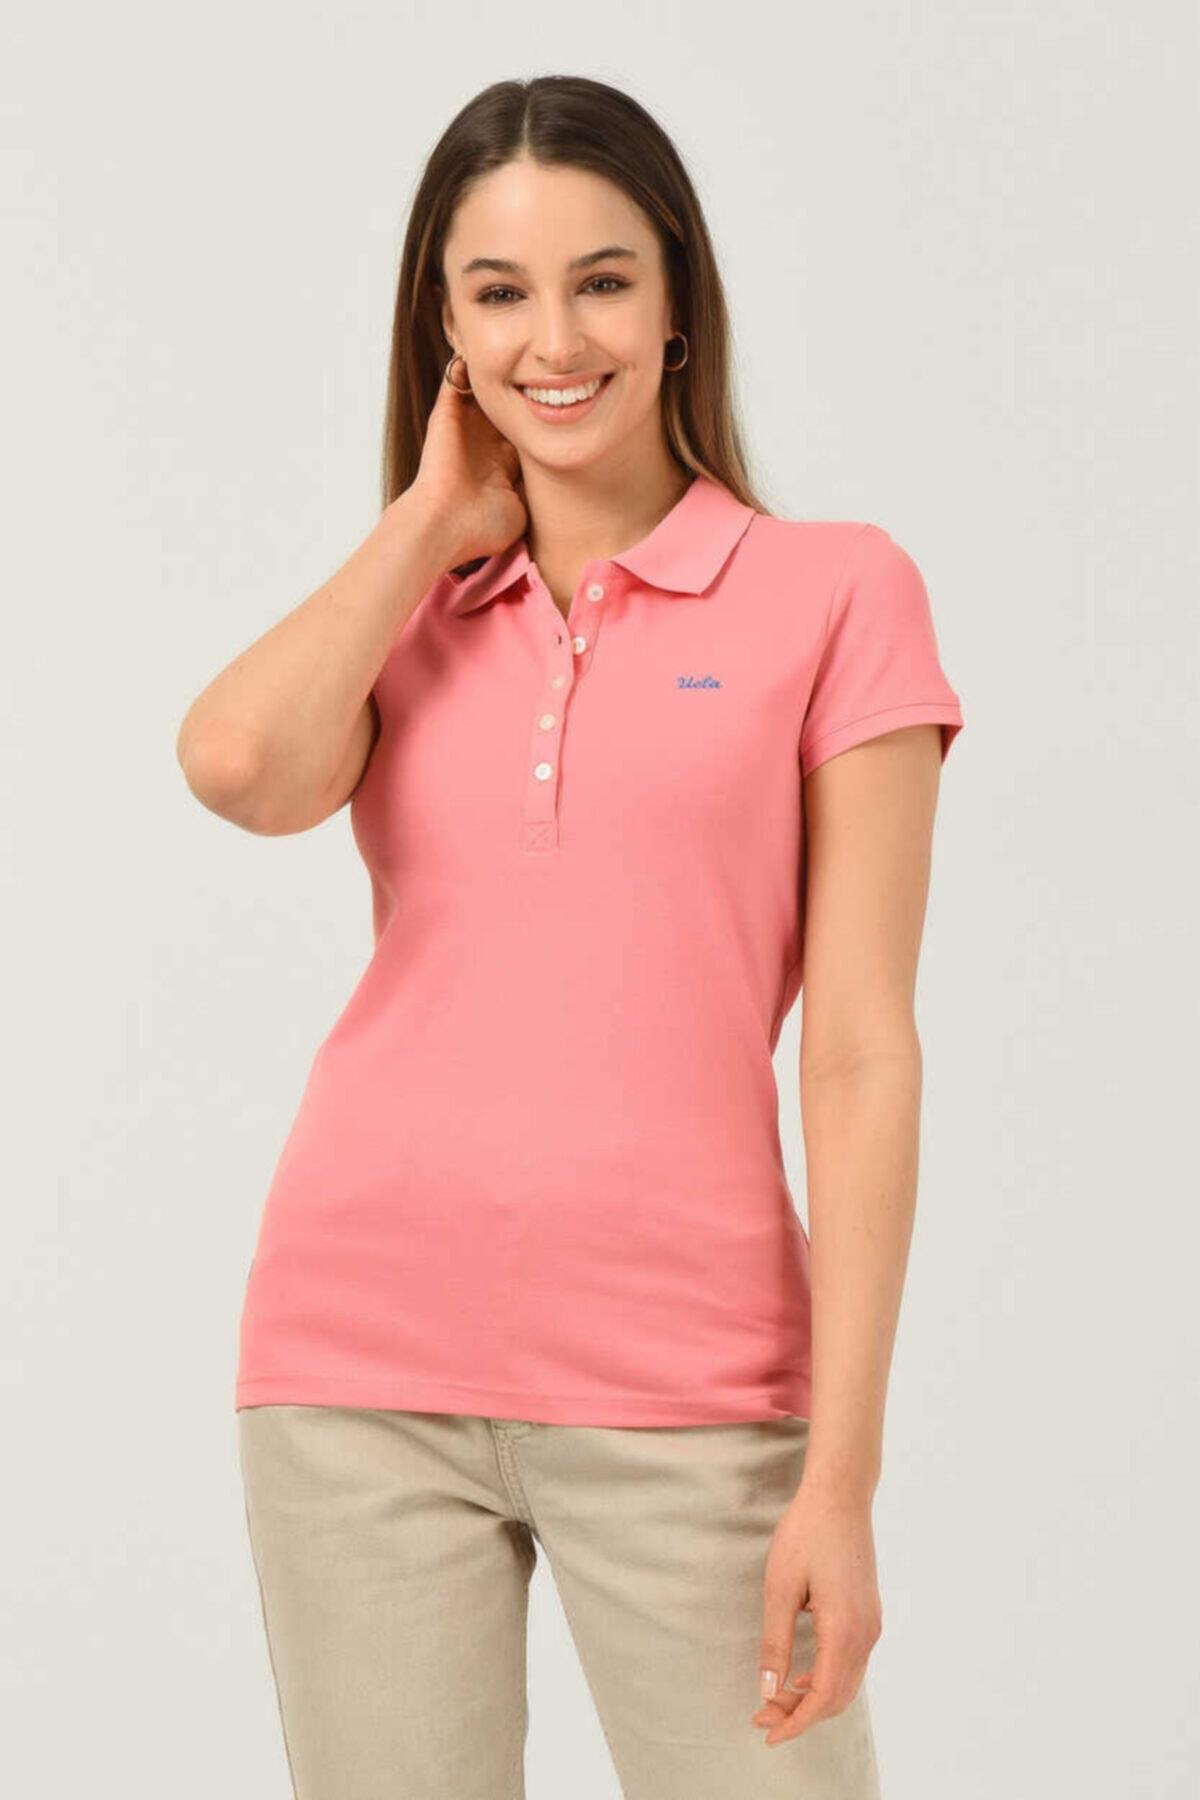 Shaver Pembe Polo Yaka Nakışlı Kadın Tshirt